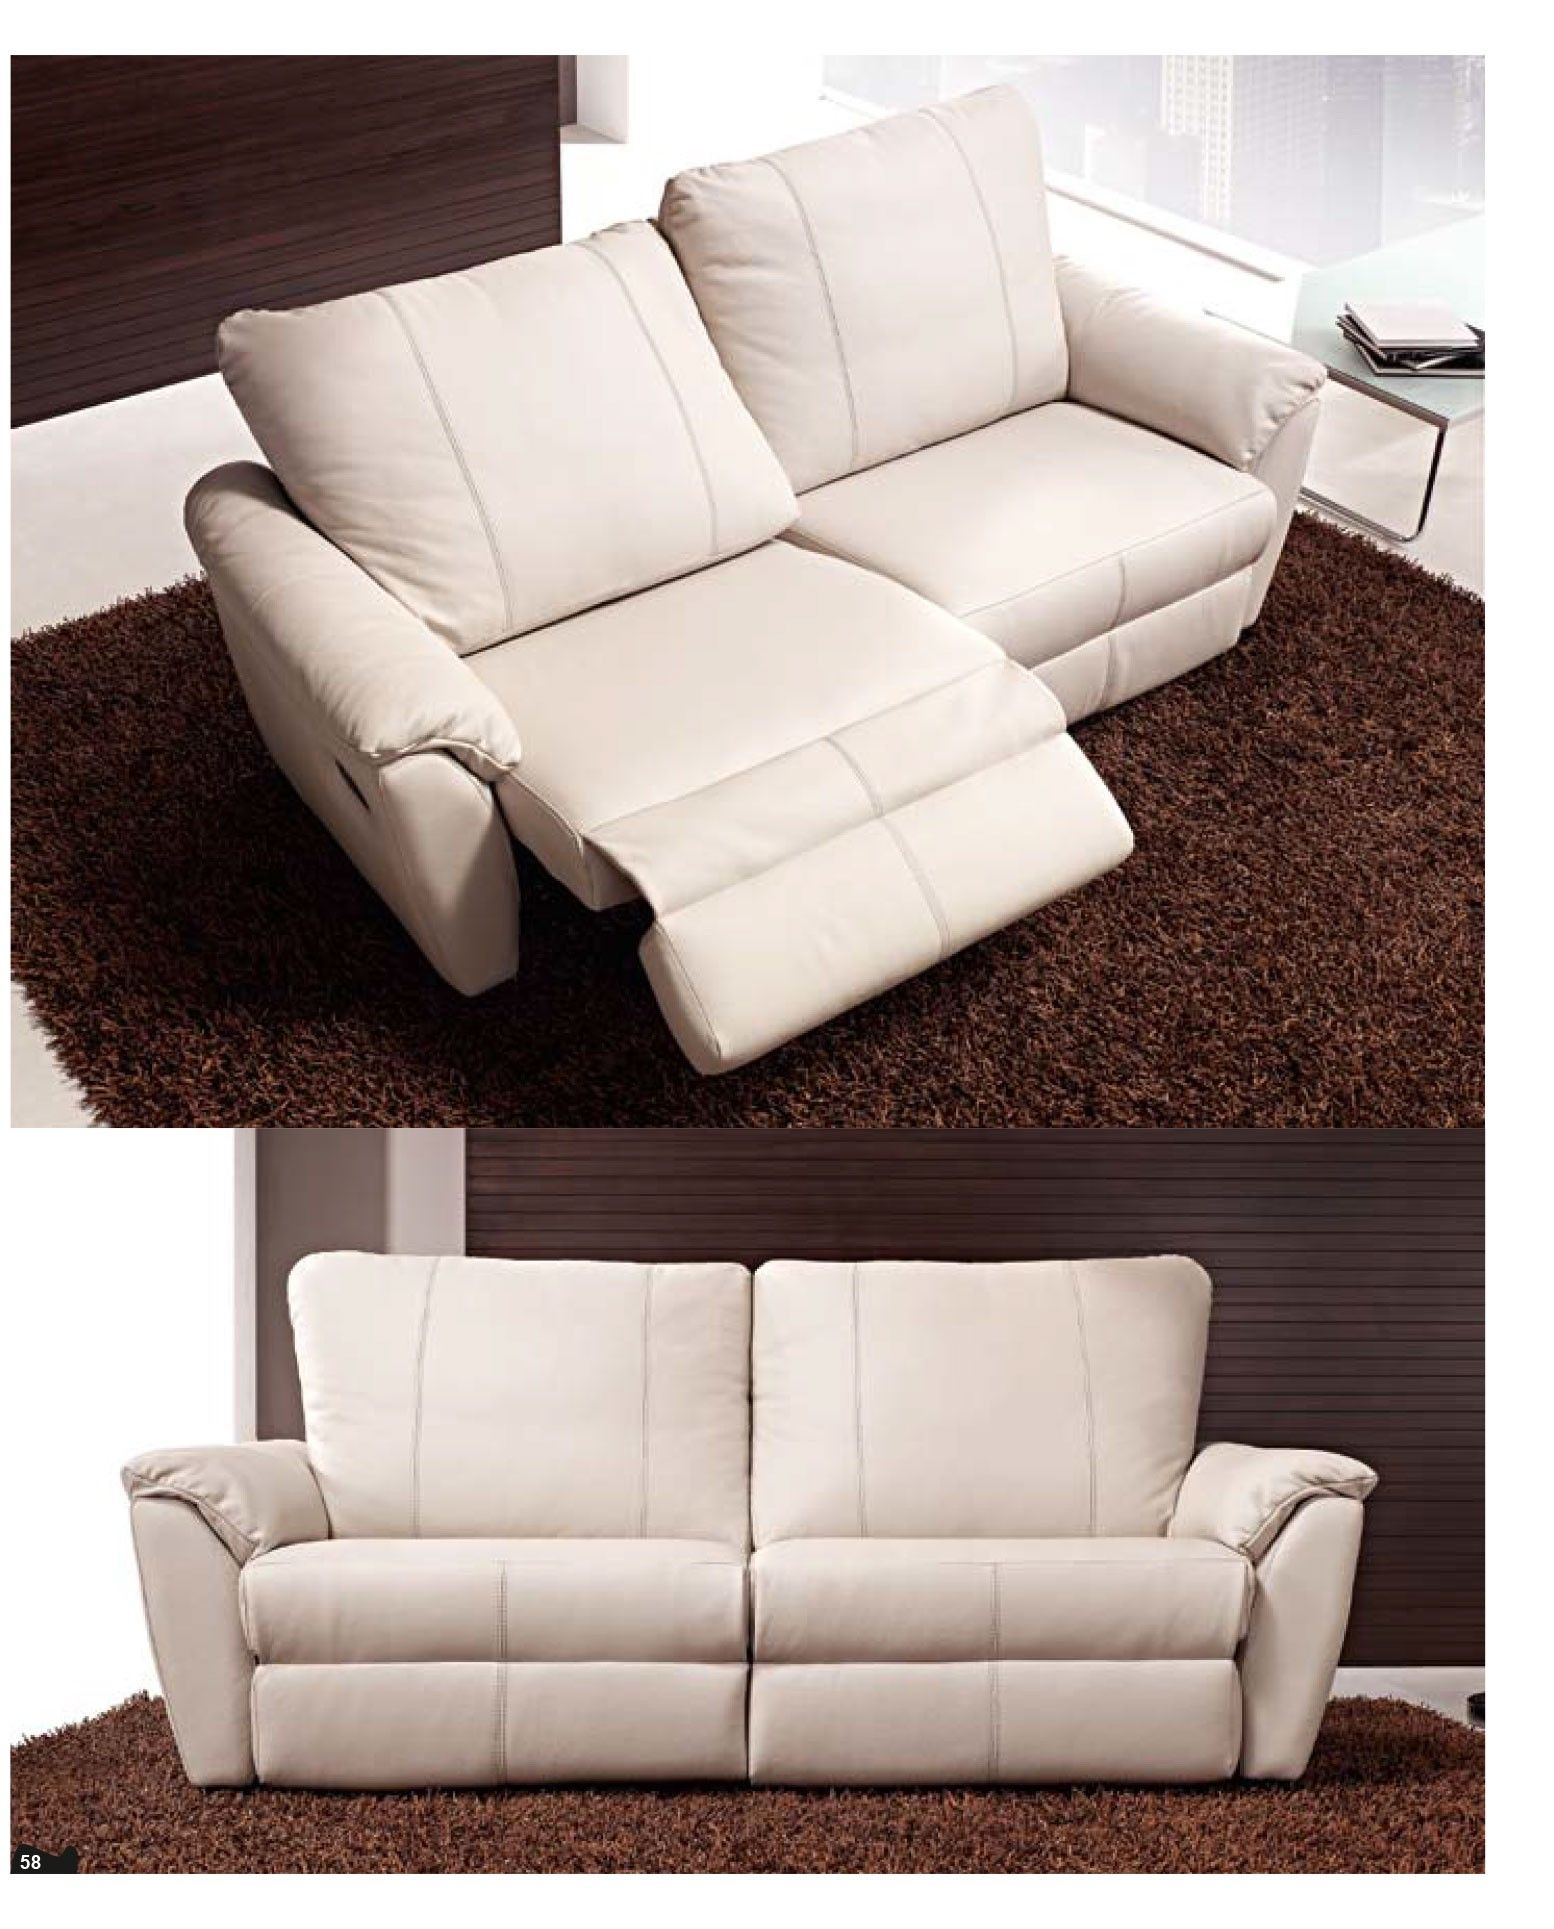 fabric image havana p set sofa modern park reclining loveseat grove